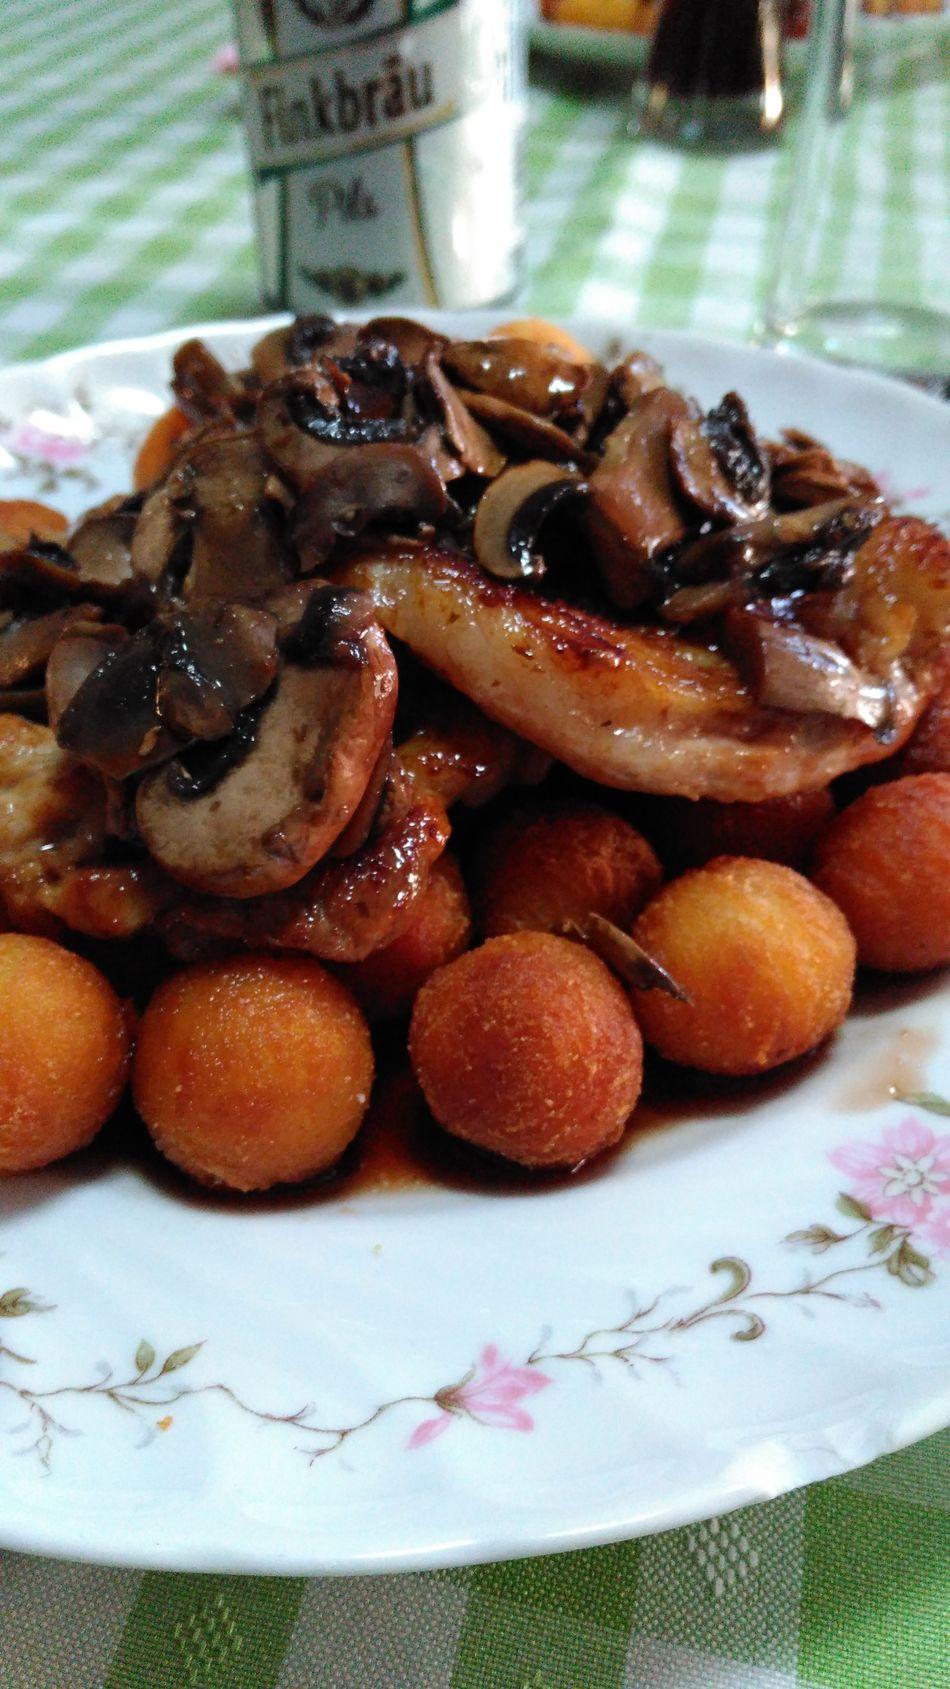 Food Foodporn Foodphotography Mushrooms Wine Sweet Wine